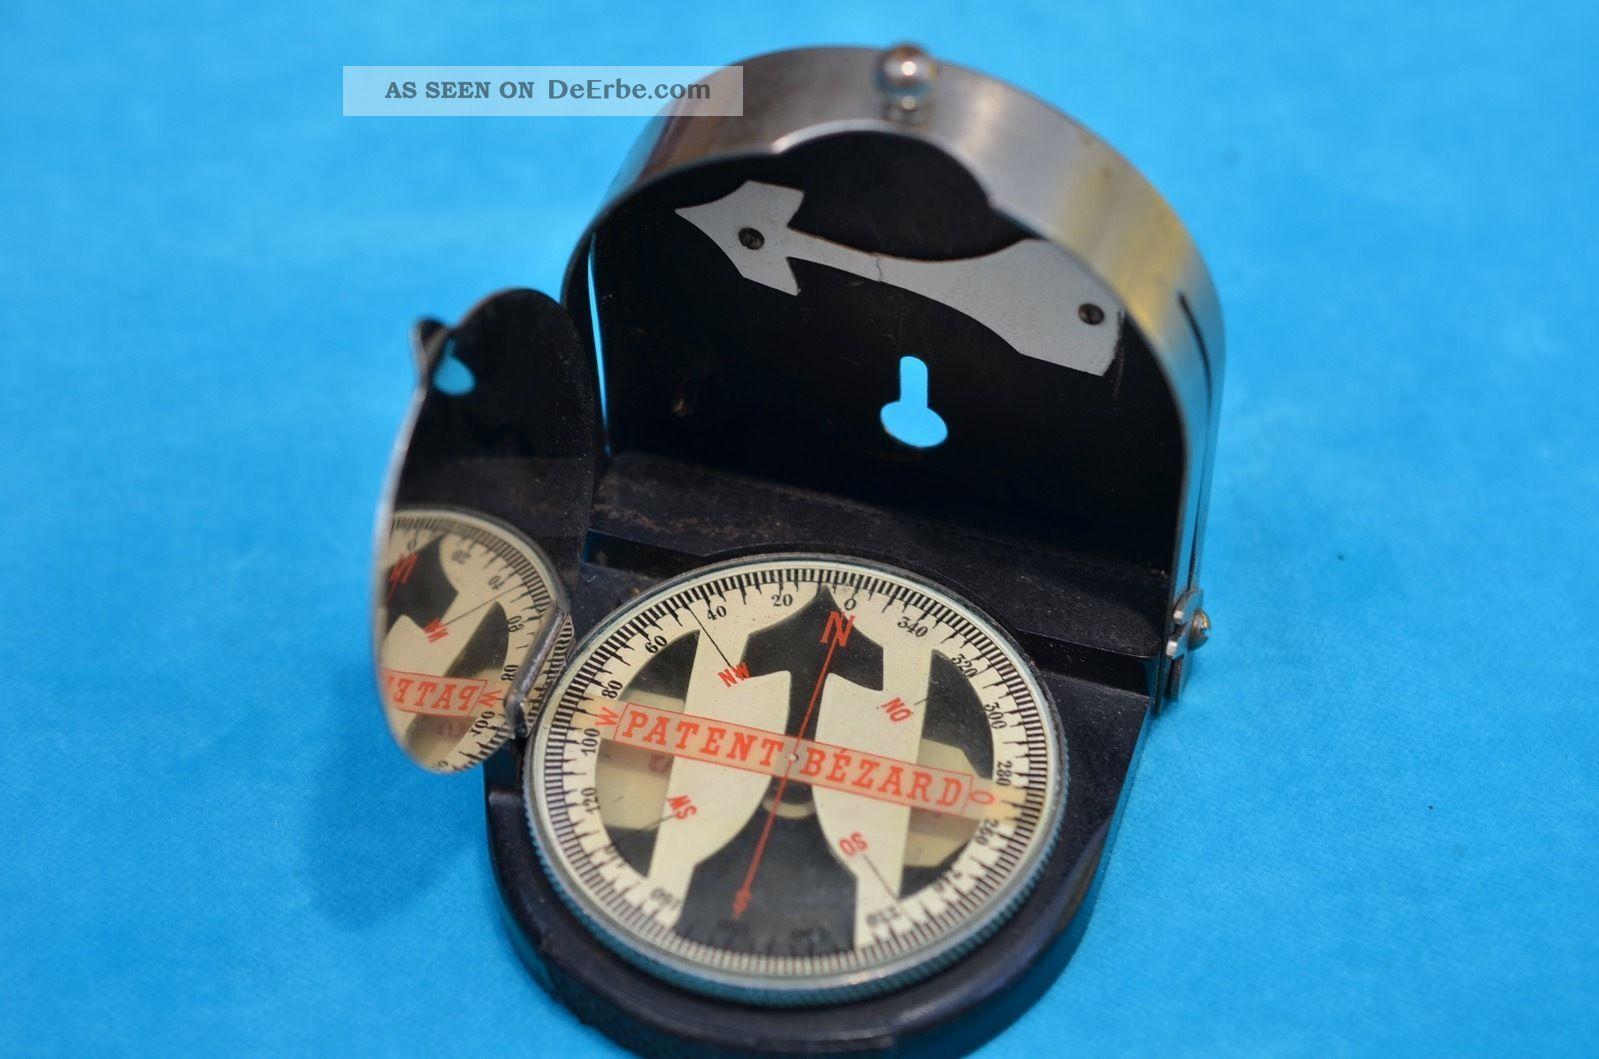 1.  Wk Alter Orig.  Patent Bézard Marschkompass Taschenkompass Armeemodell 1910 Ii Technik & Instrumente Bild